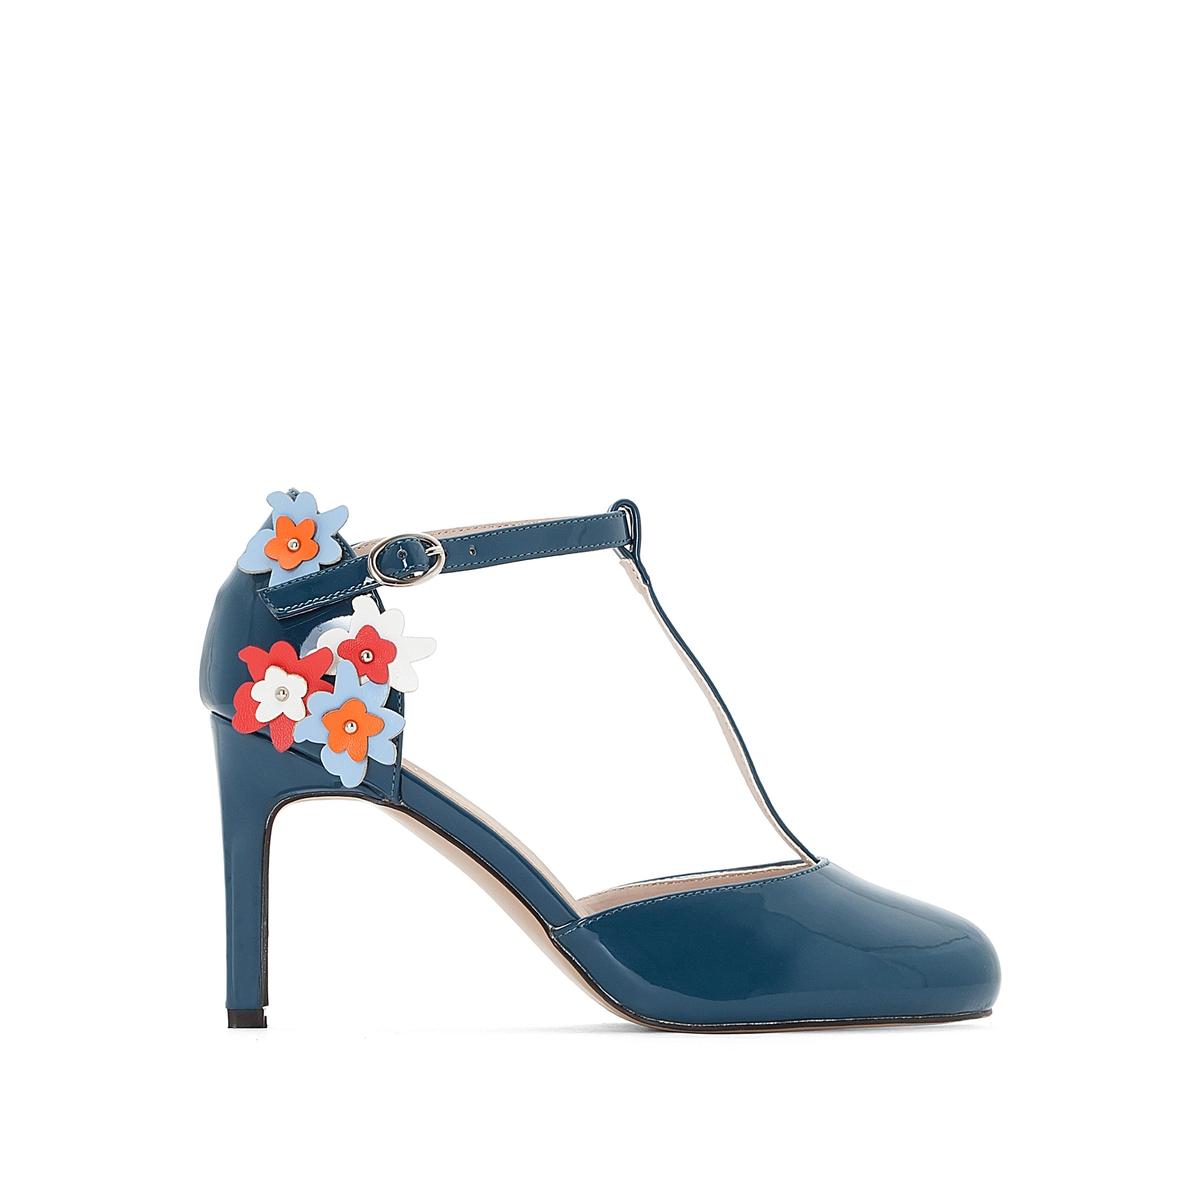 zapatillas Zapatos de tac?n T bar con detalles de flores